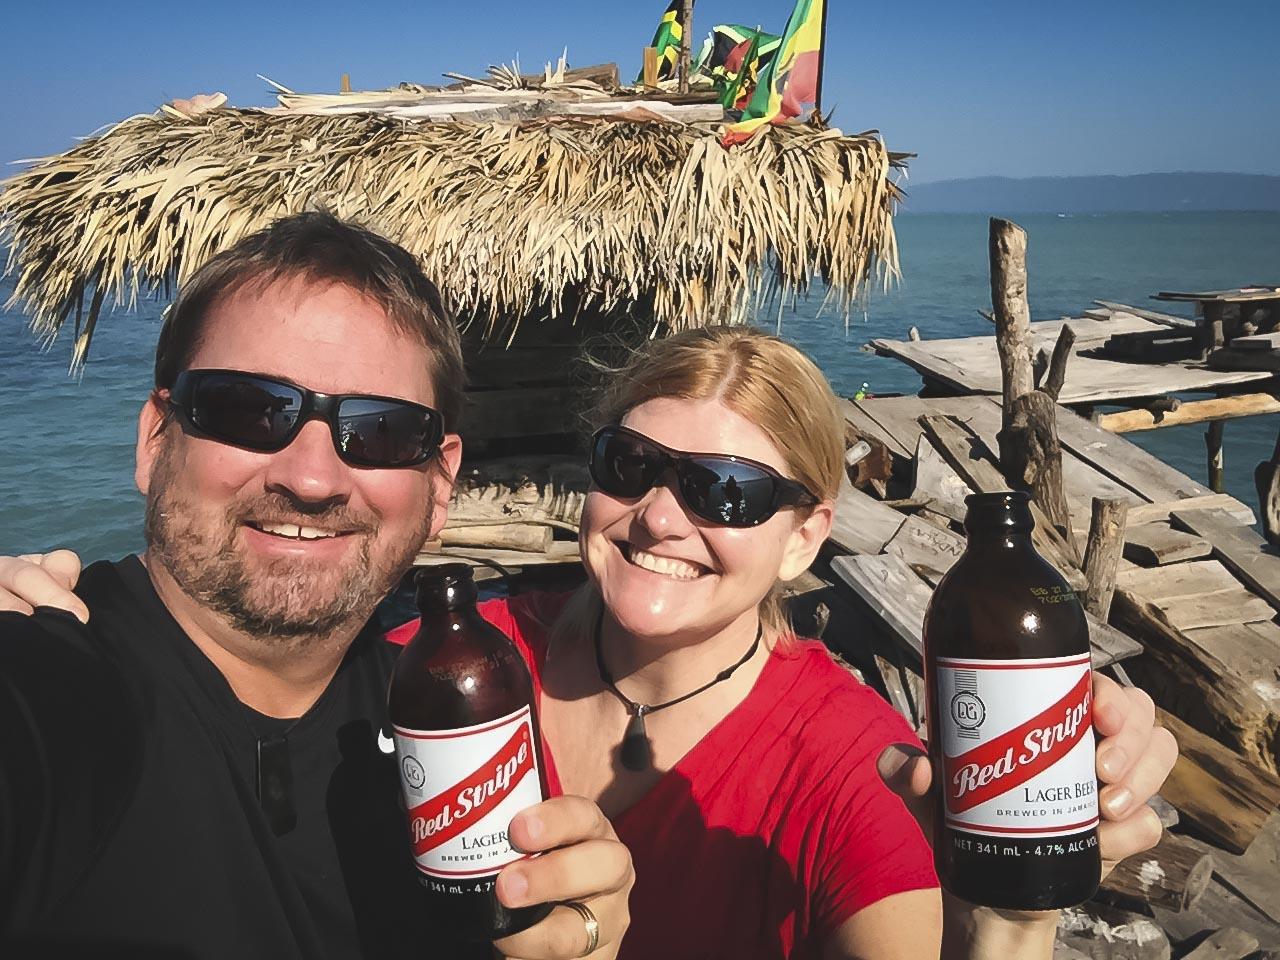 Red Stripe Beer in Jamaica